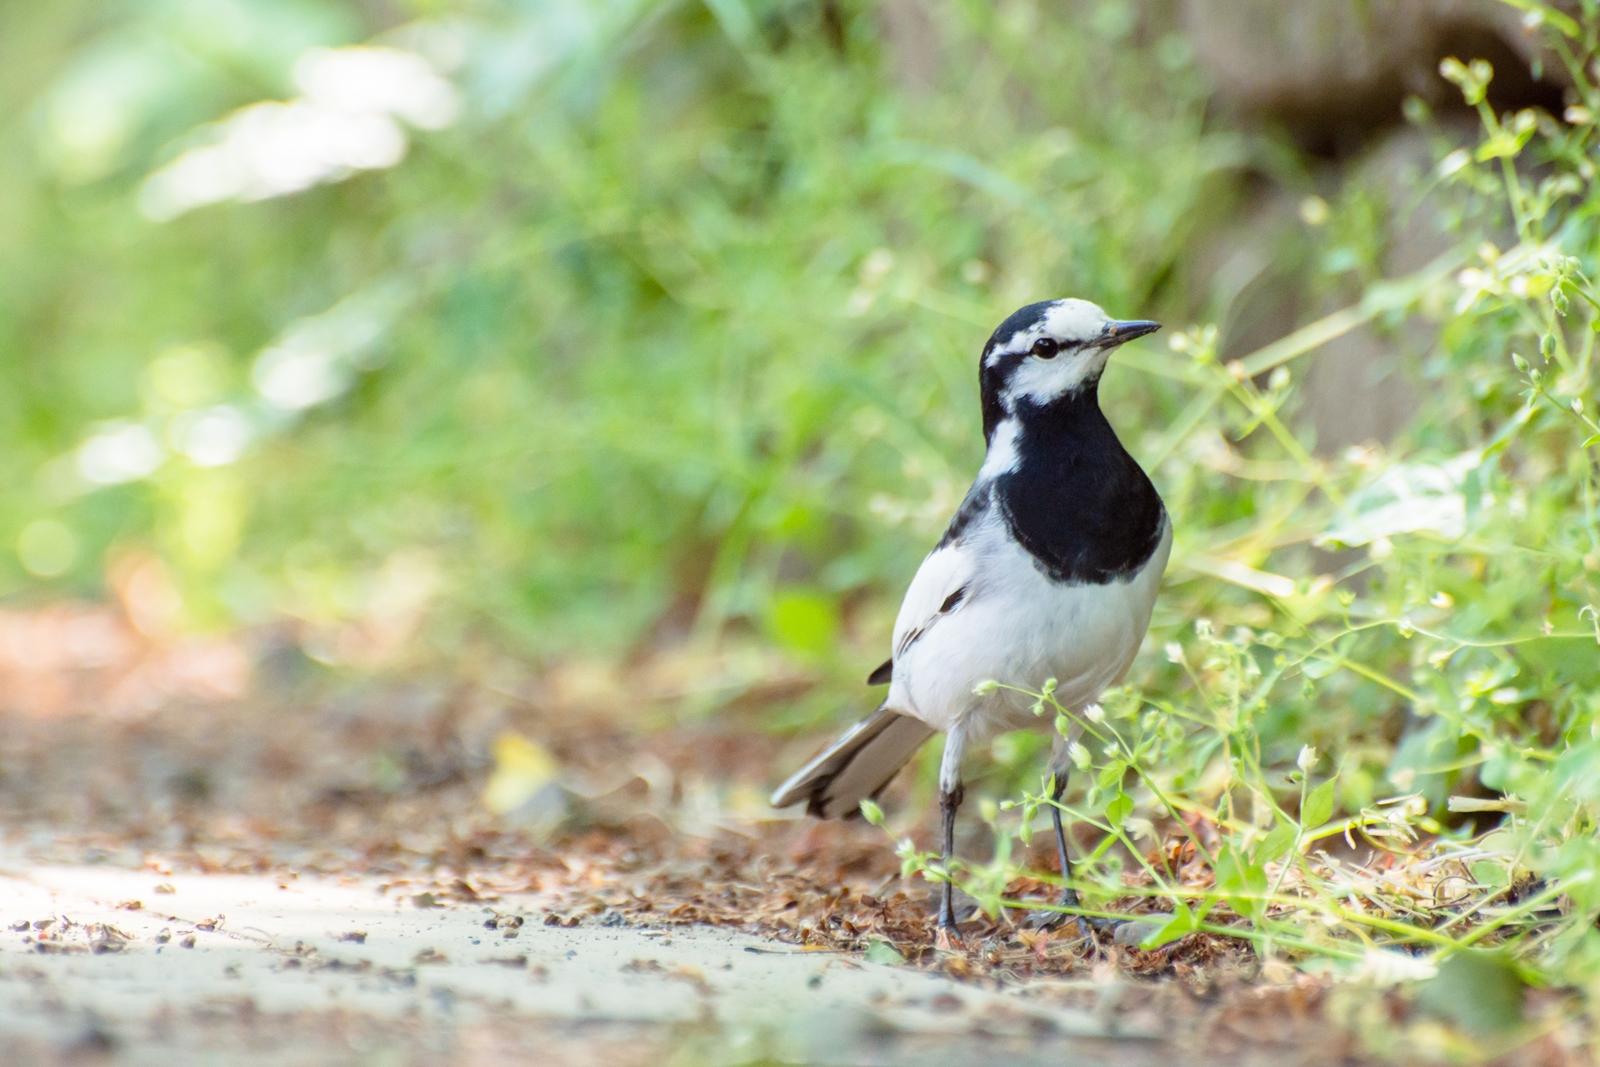 Photo: 草花との小さなお喋り Conversation with a young grasses.  あちらこちらから ぐんぐん伸びる草花たち どこからか聞こえてくる 小さなお喋り  White Wagtail. (ハクセキレイ)  #birdphotography #birds #cooljapan #nikon #kawaii  Nikon D7200 Nikon AF-S VR Zoom-Nikkor 70-300mm f/4.5-5.6G IF-ED